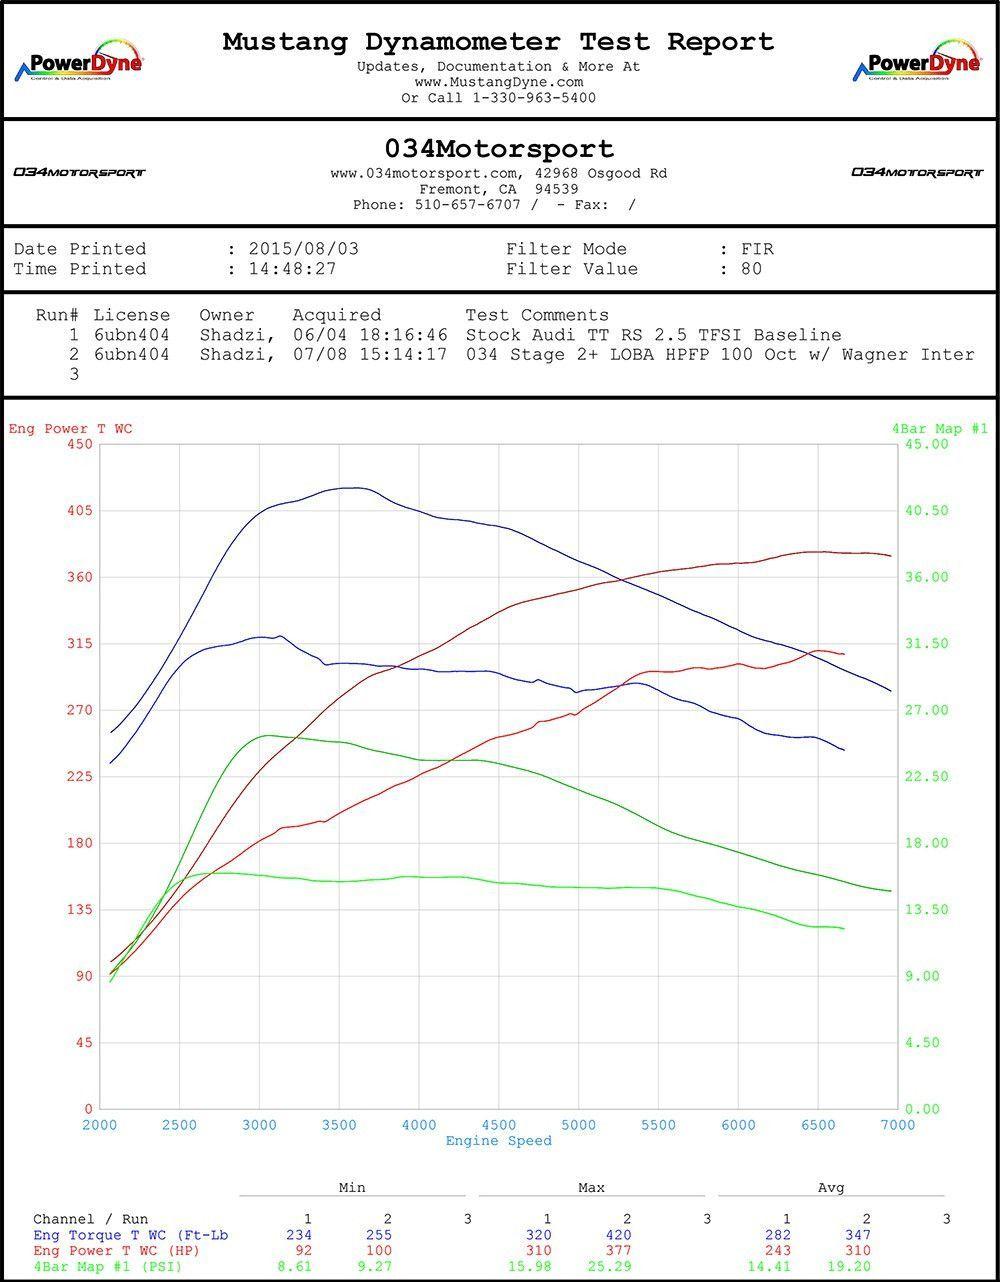 hight resolution of 034motorsport audi ttrs 2 5 tfsi stage 2 hpfp ecu upgrade performance software audi turbo brakes turbokit bsh ledlights coilpacks apr ctsturbo